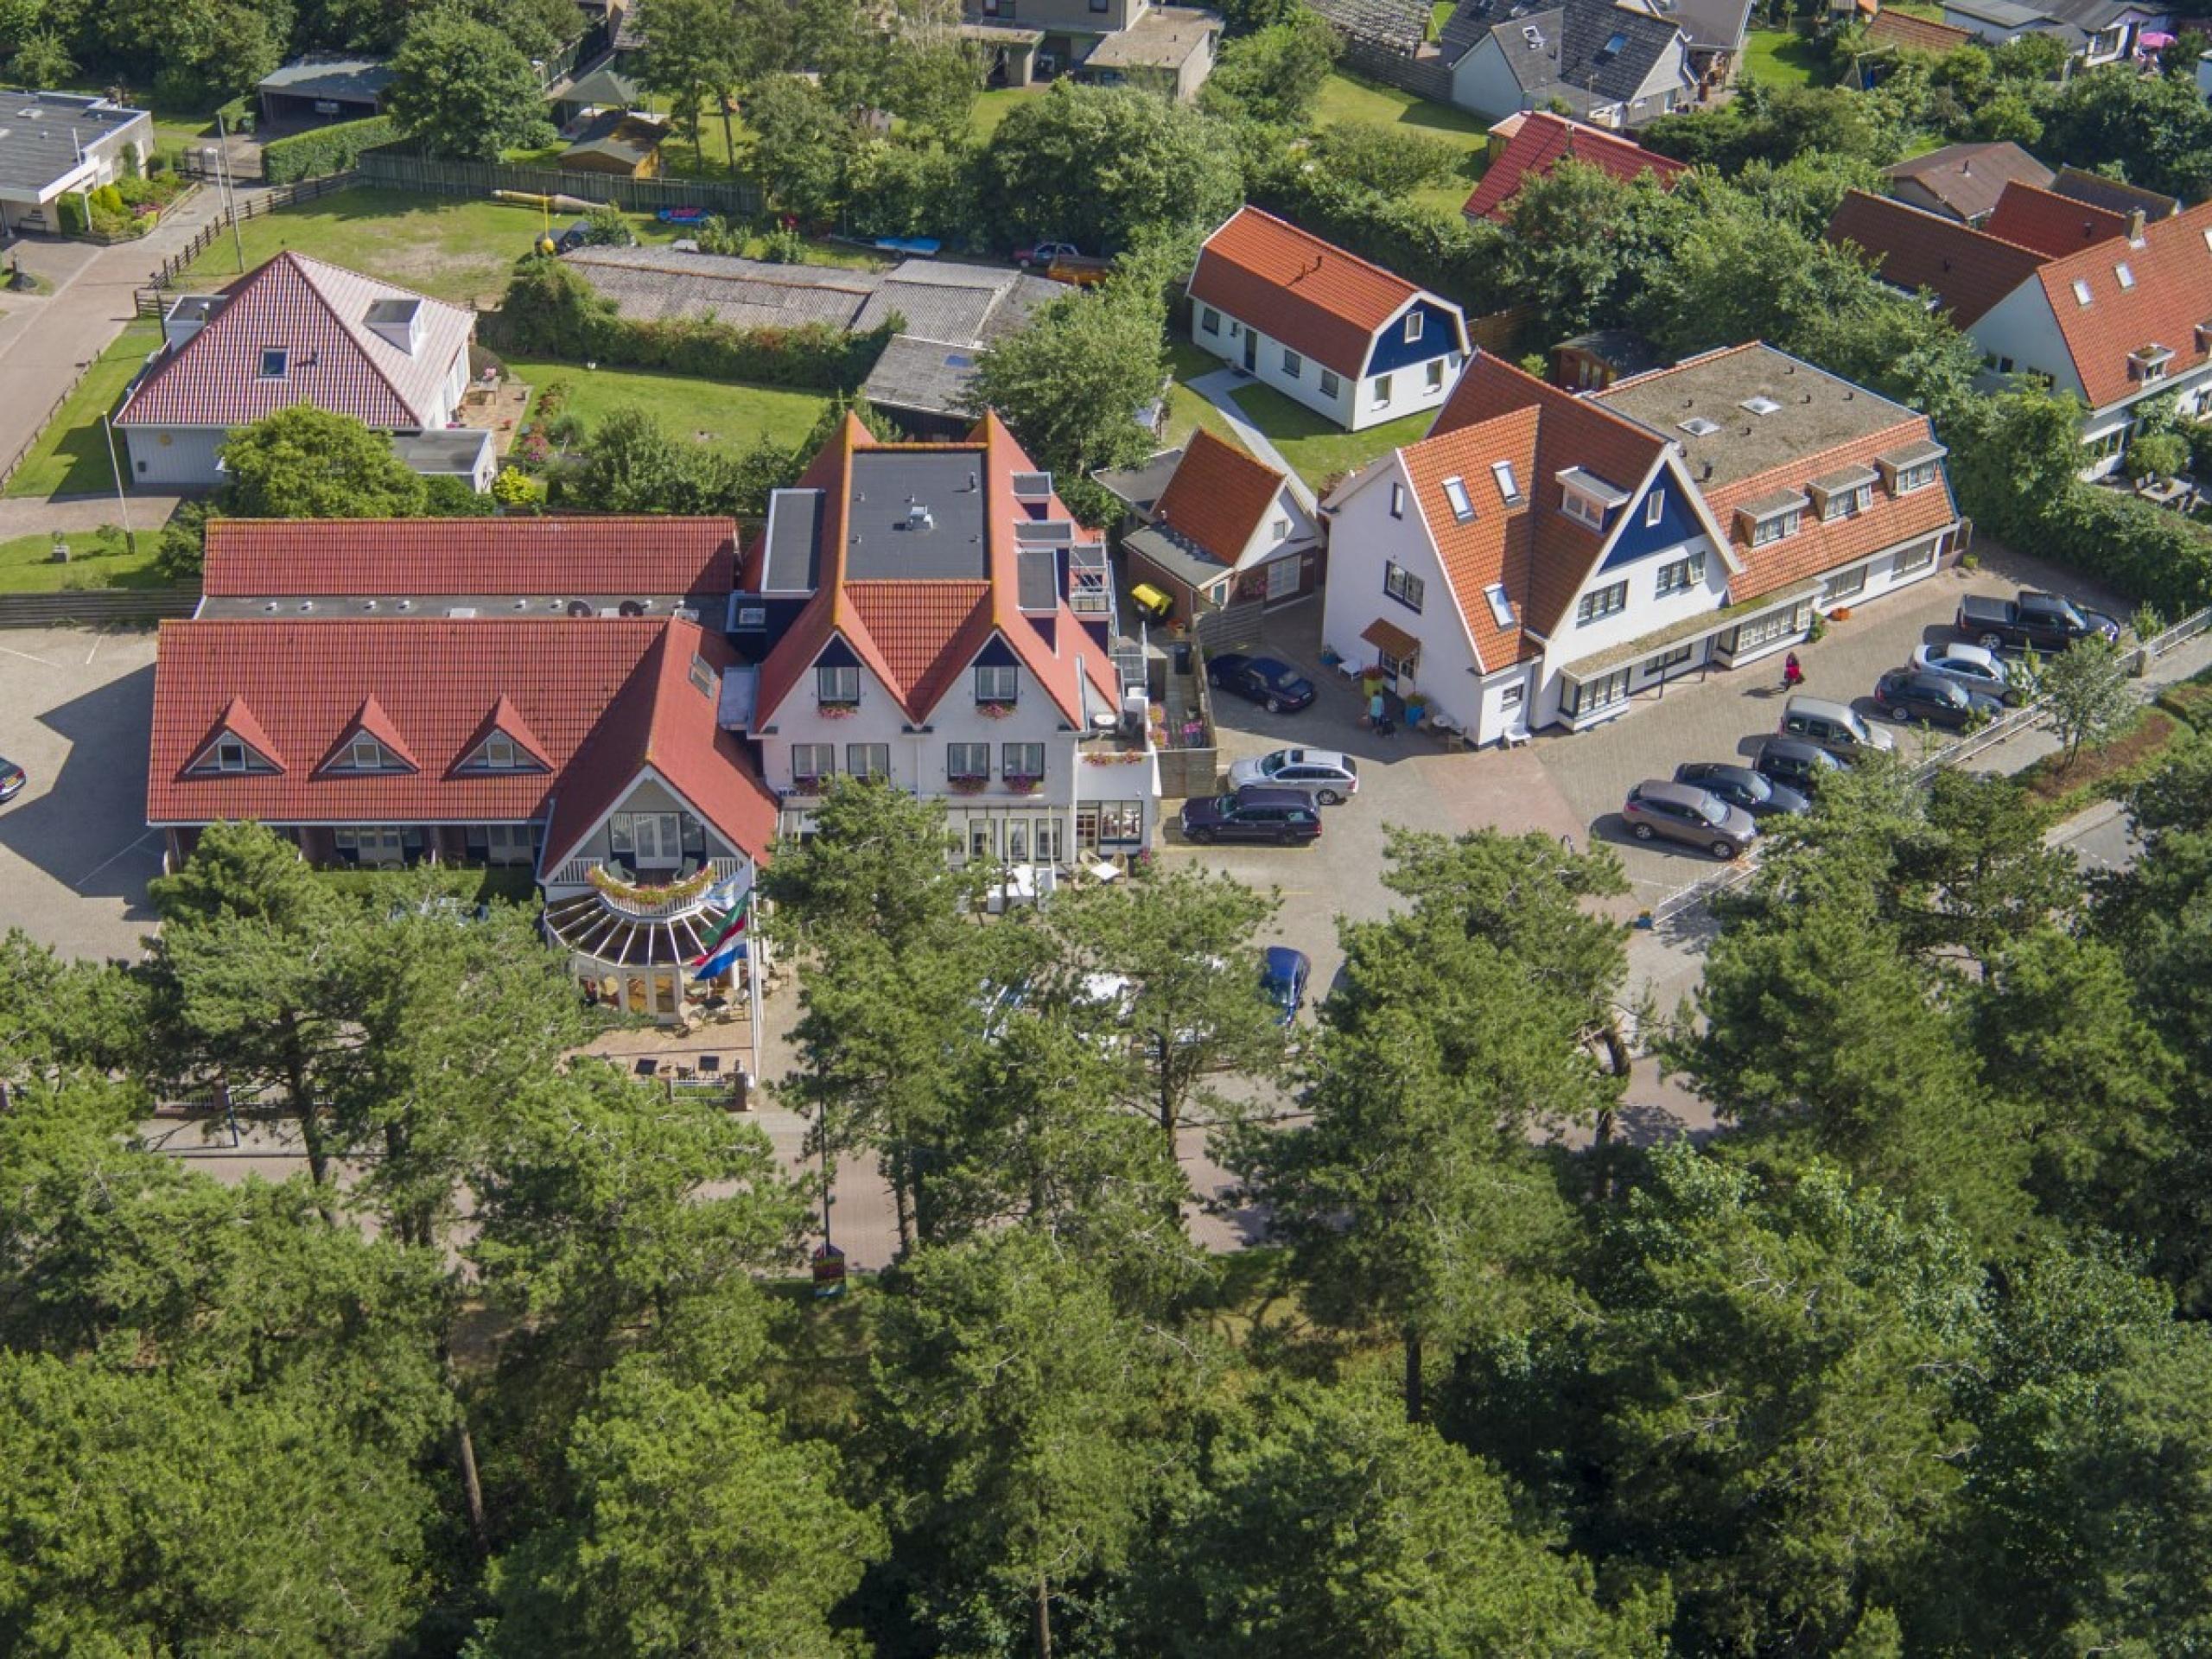 Hotelzimmer mit Terrasse in der Nähe des Nordseestrandes in De Koog